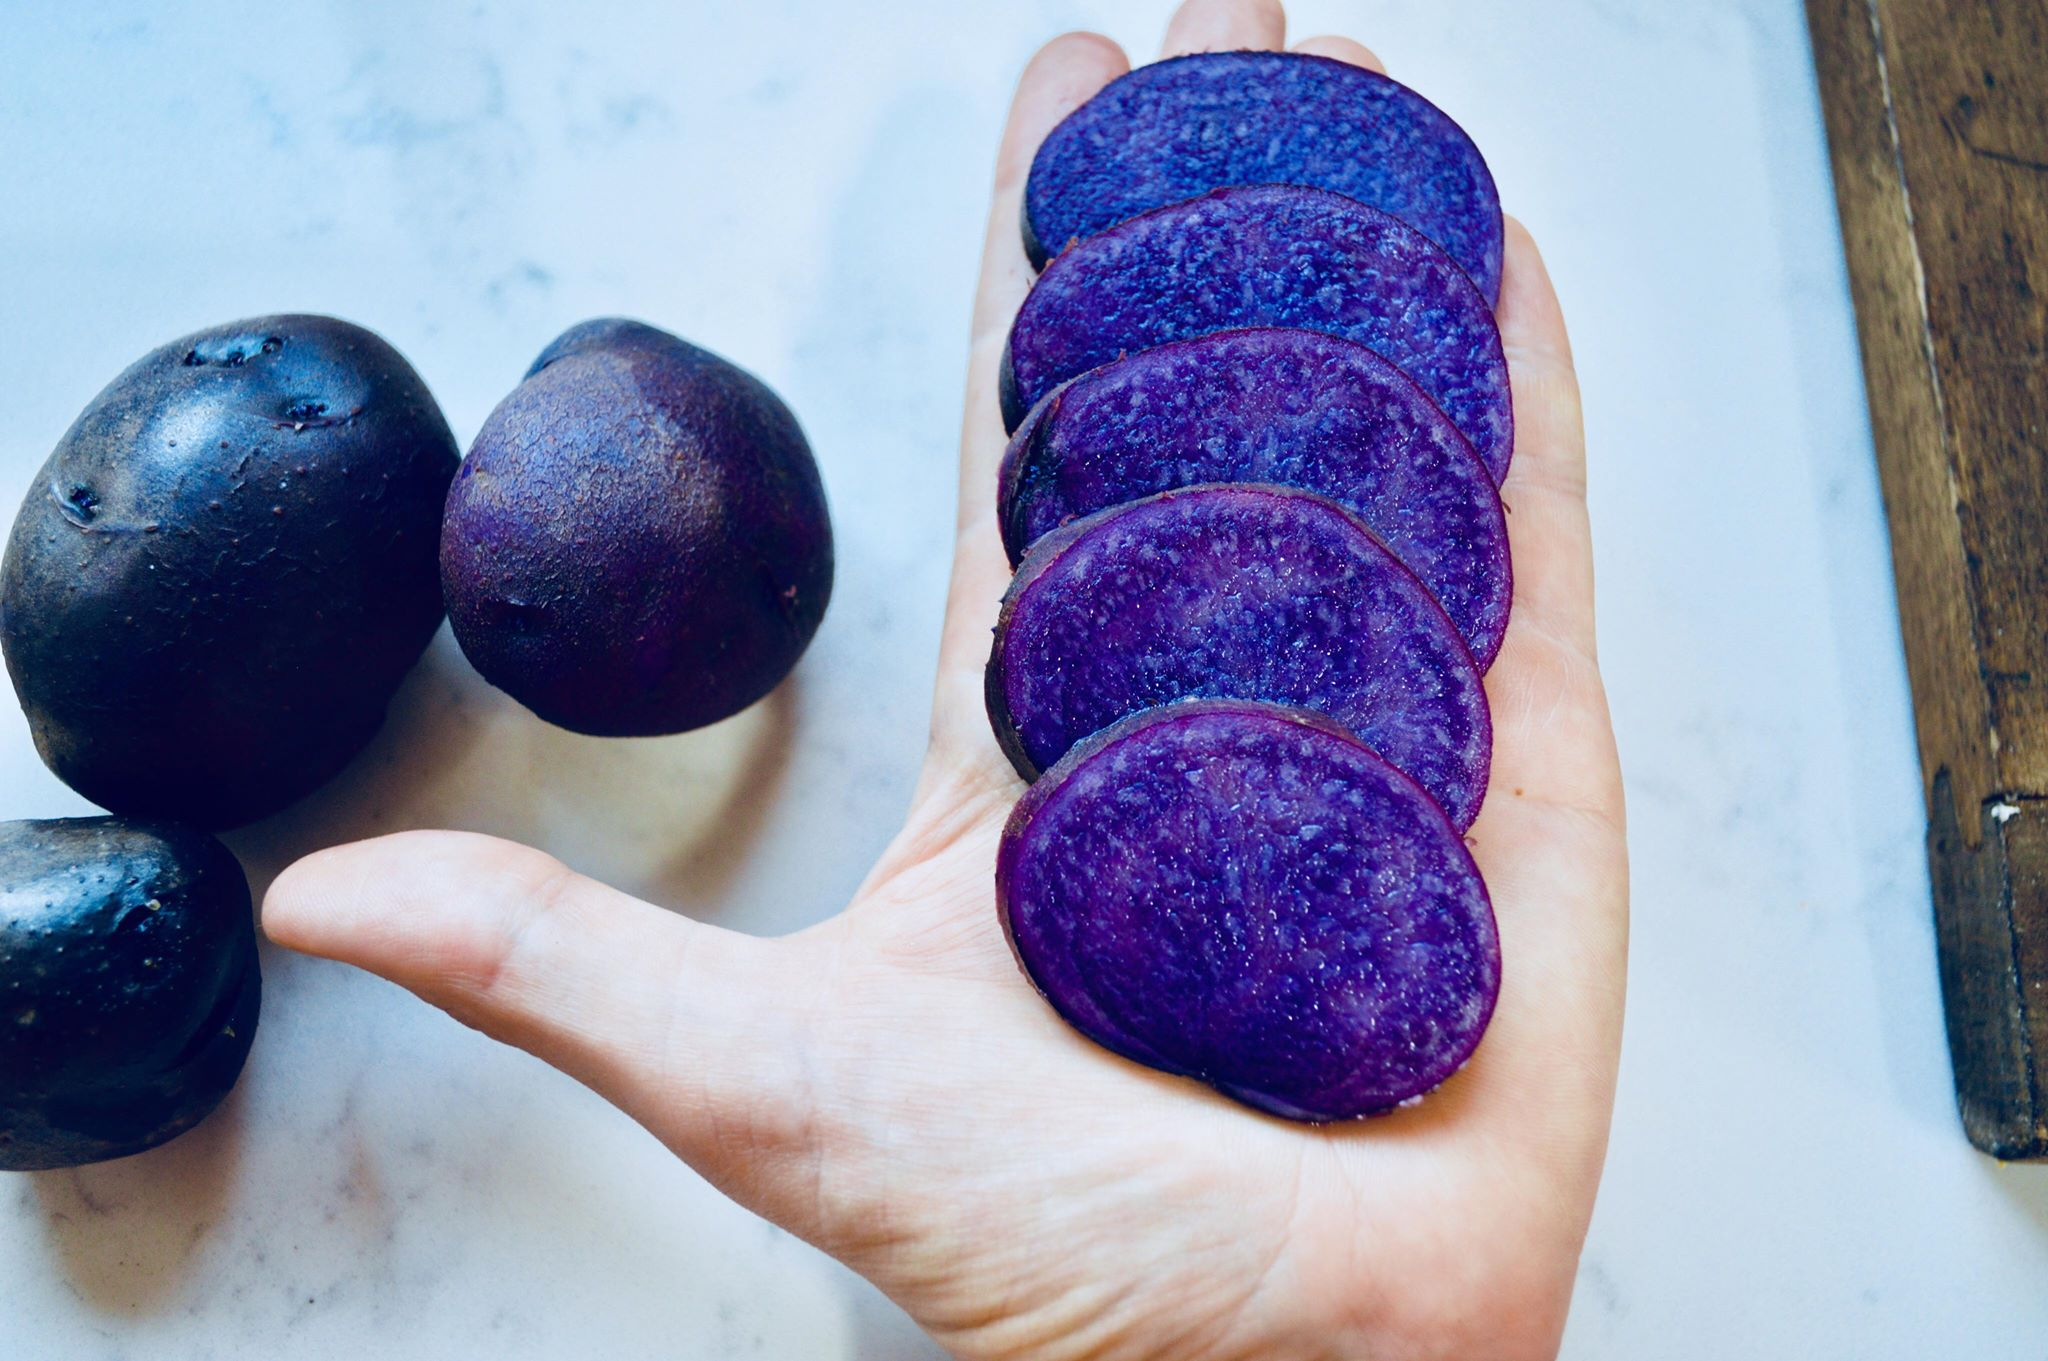 purple potatoes, modern homestead, summer harvest, organic life, plant based home